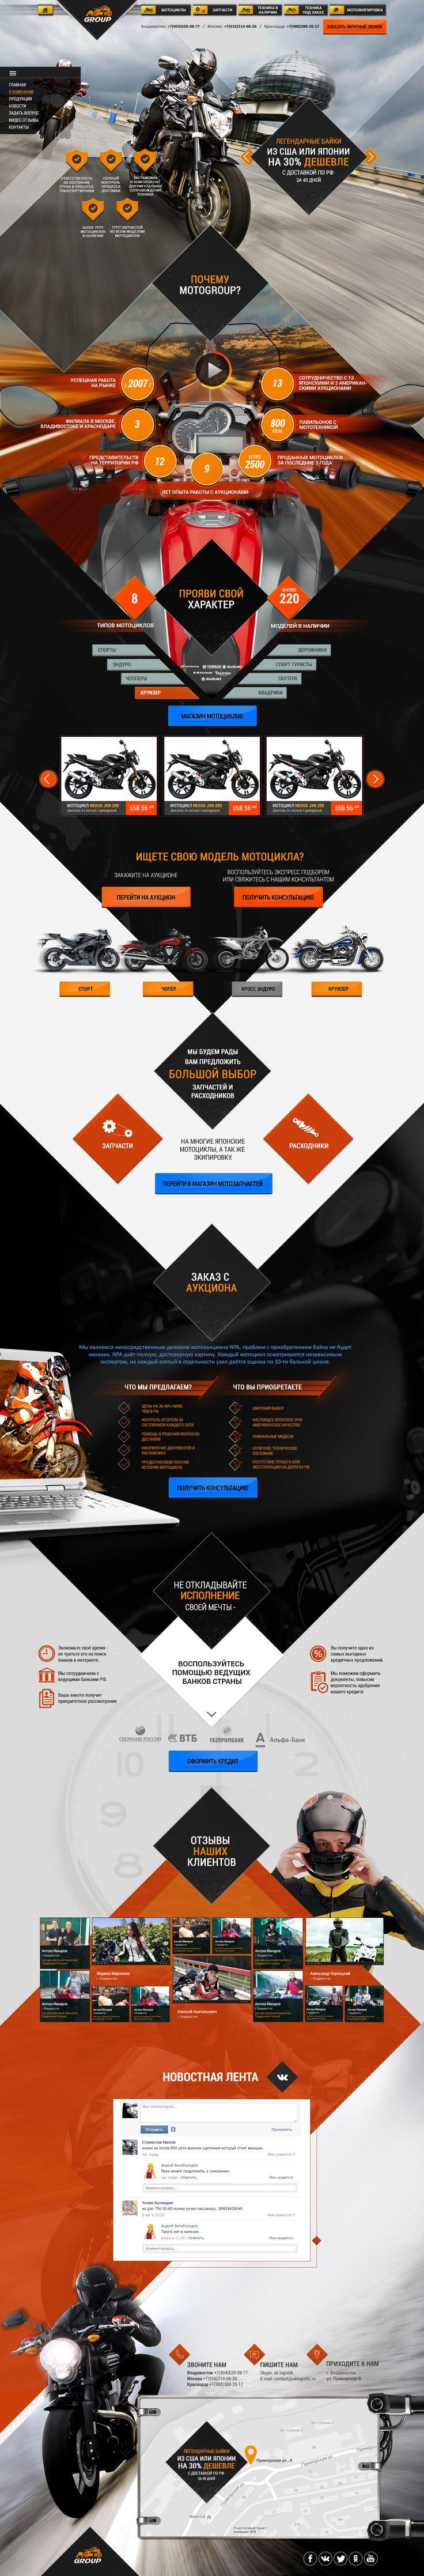 MOTOGROUP #landing, #page, #design, #web, #HTML5, #photoshop, #website, #opencart, #cms, #onlinestore, #motorbike, #motorcycle, #chopper, #sportbike, #racing, #extreme